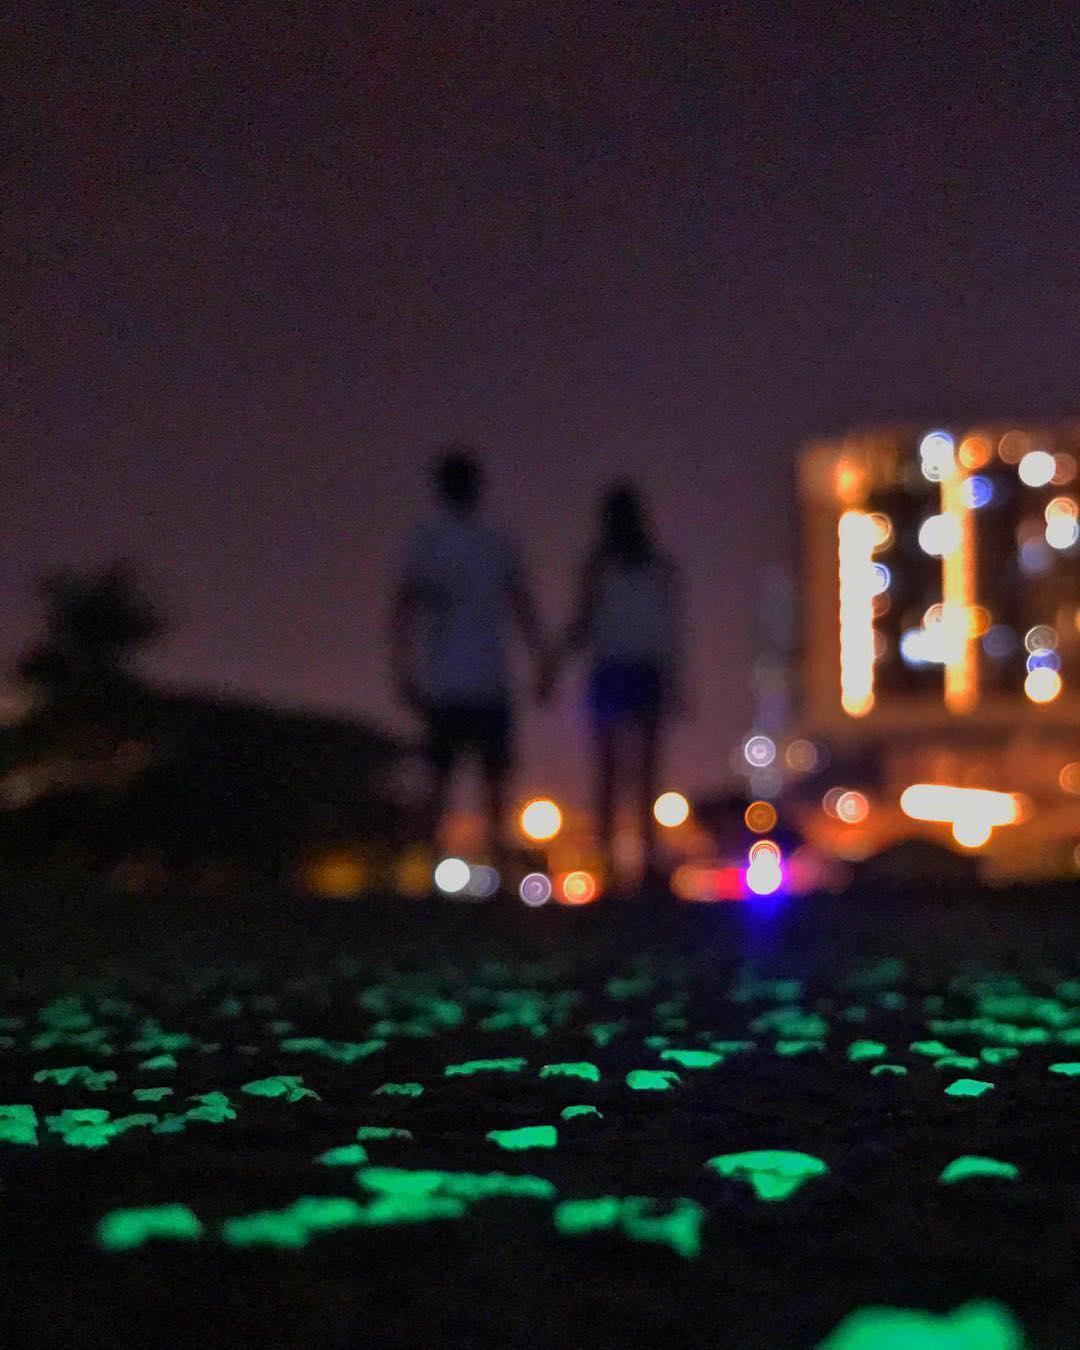 glow in the dark path